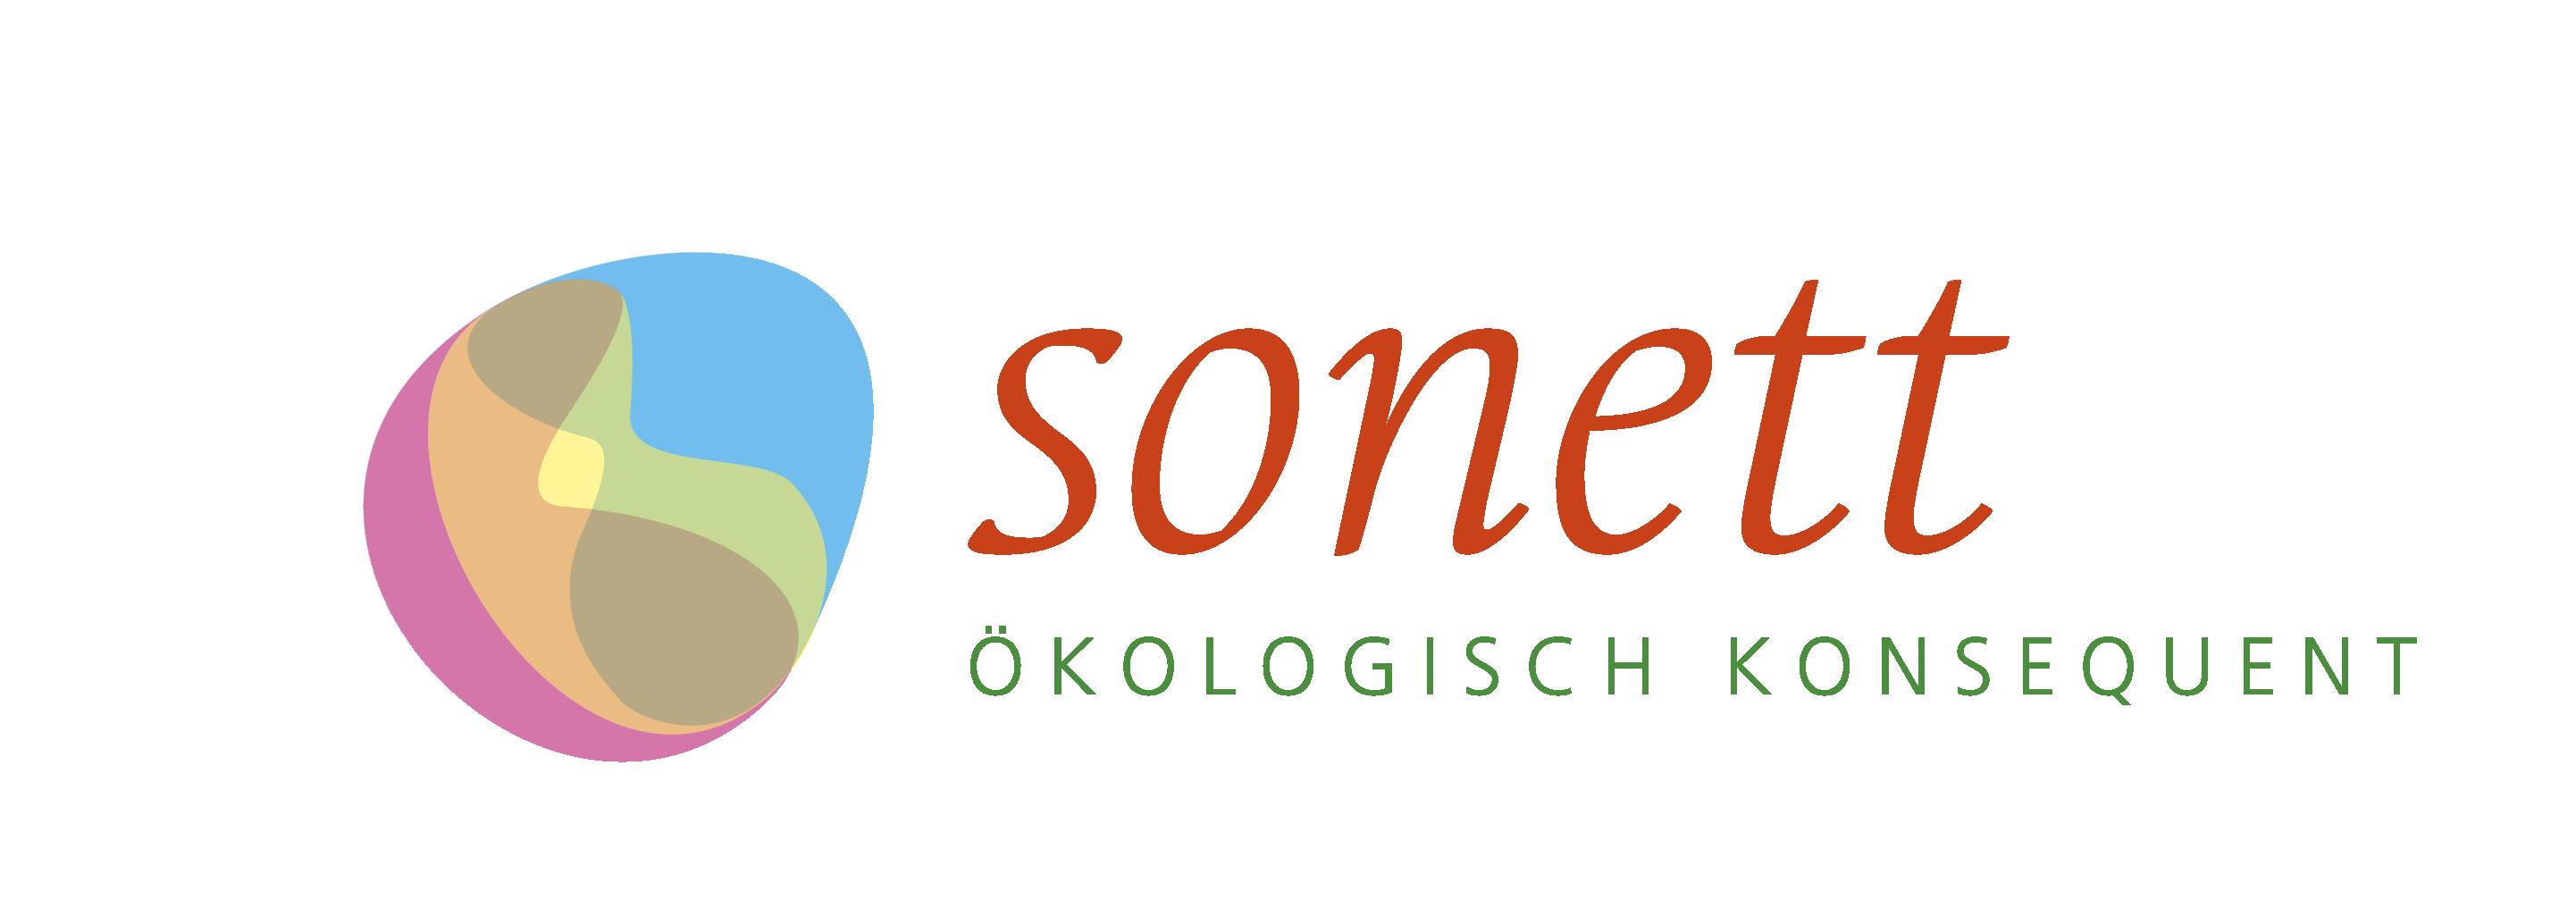 sonett_logo_4c_horizontalpng